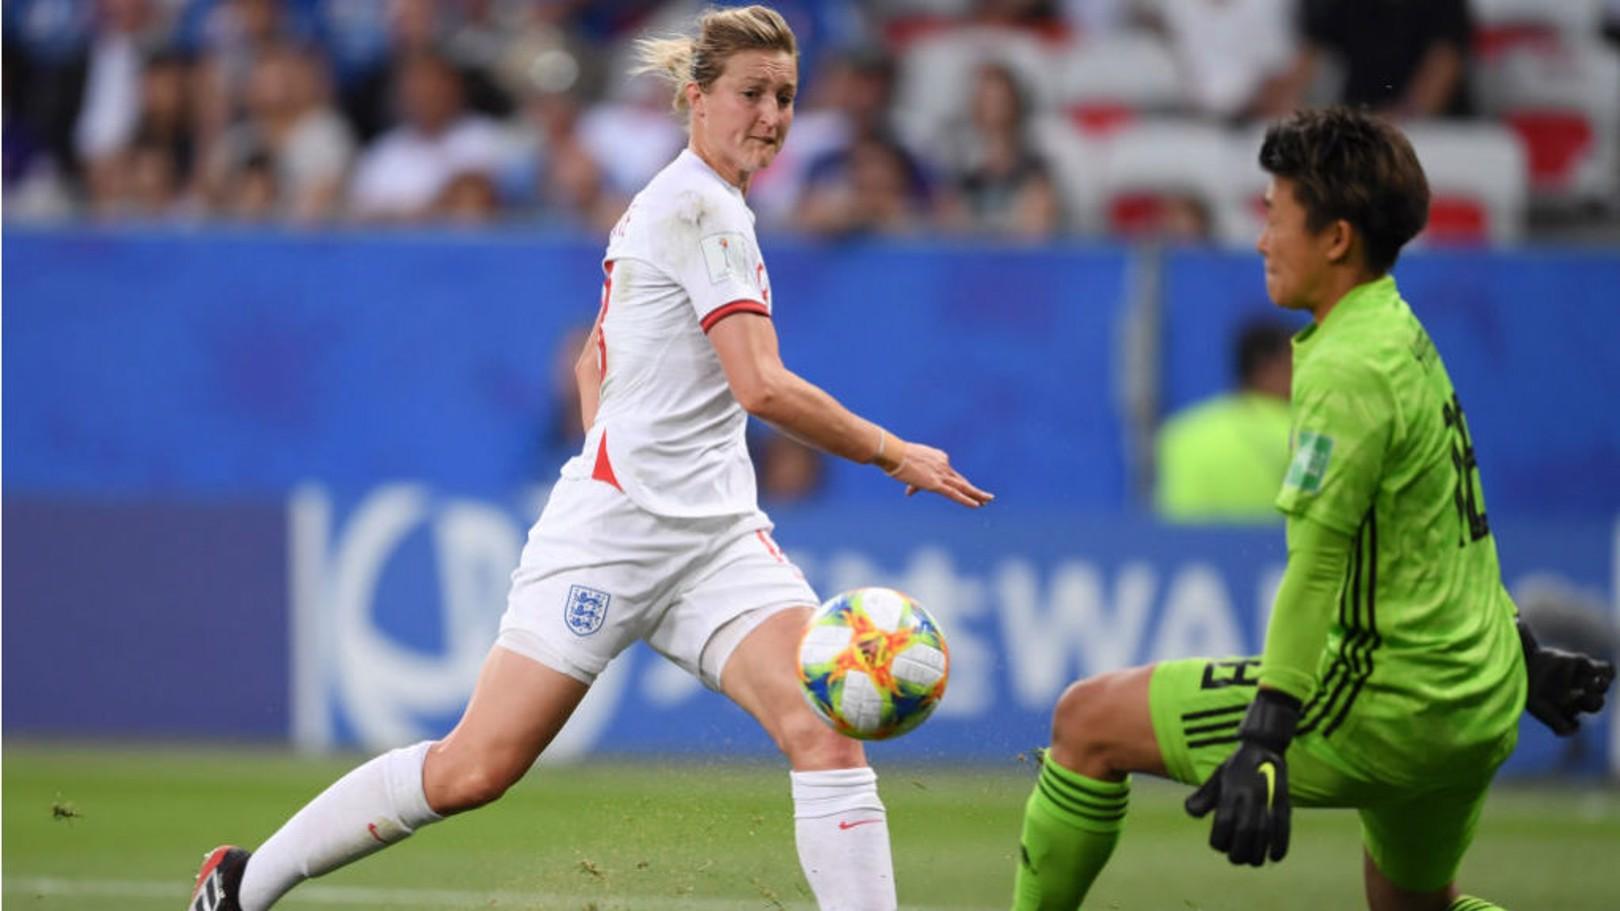 ON THE MARK: Ellen White fires England ahead against Japan